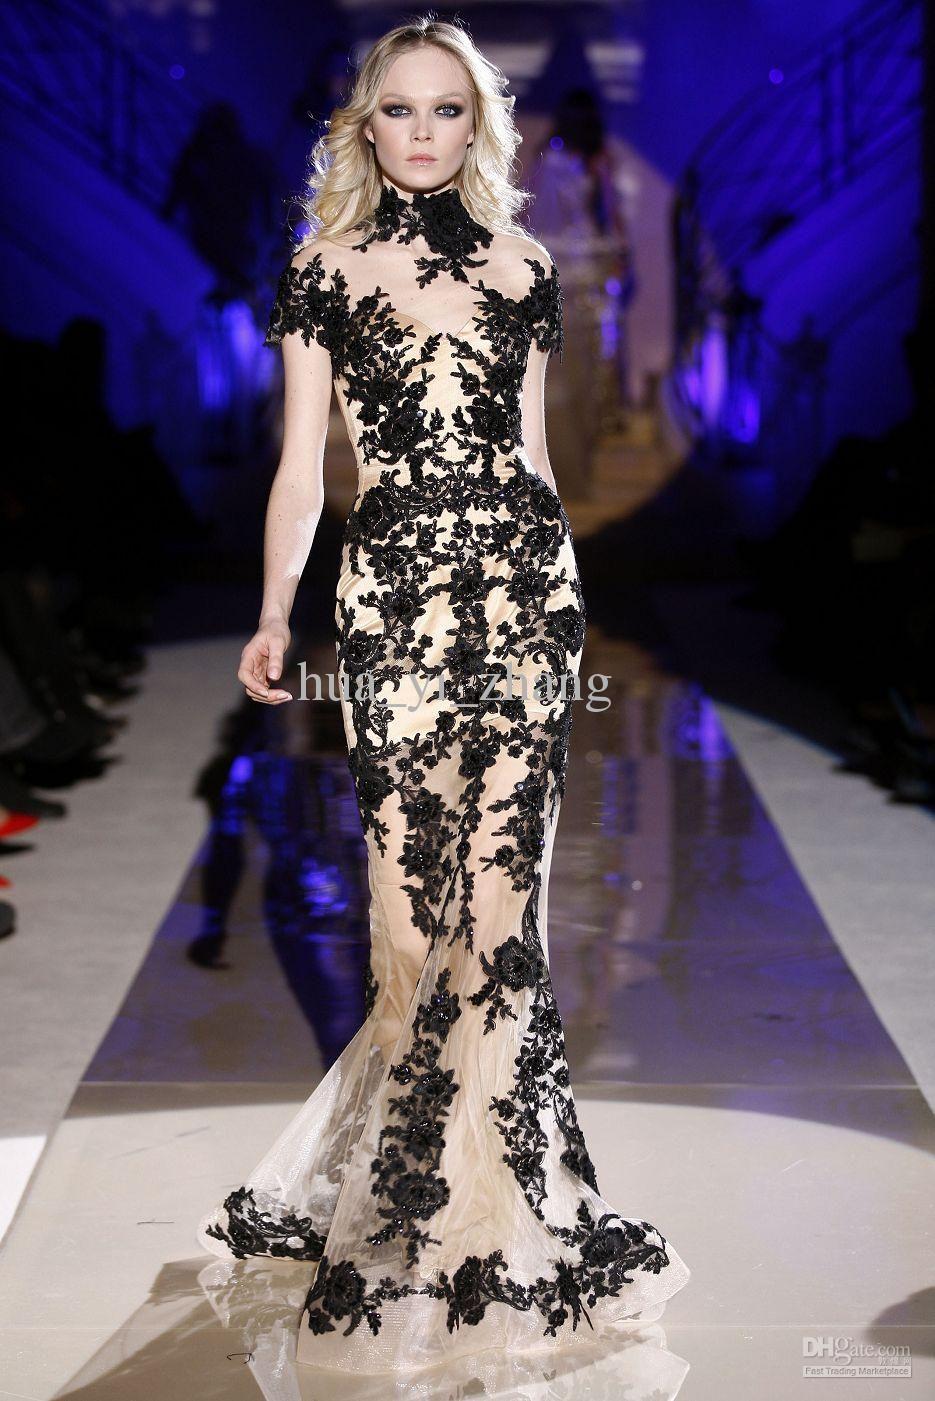 Vintage Black Mermaid Wedding Dress High Collar Short Sleeve